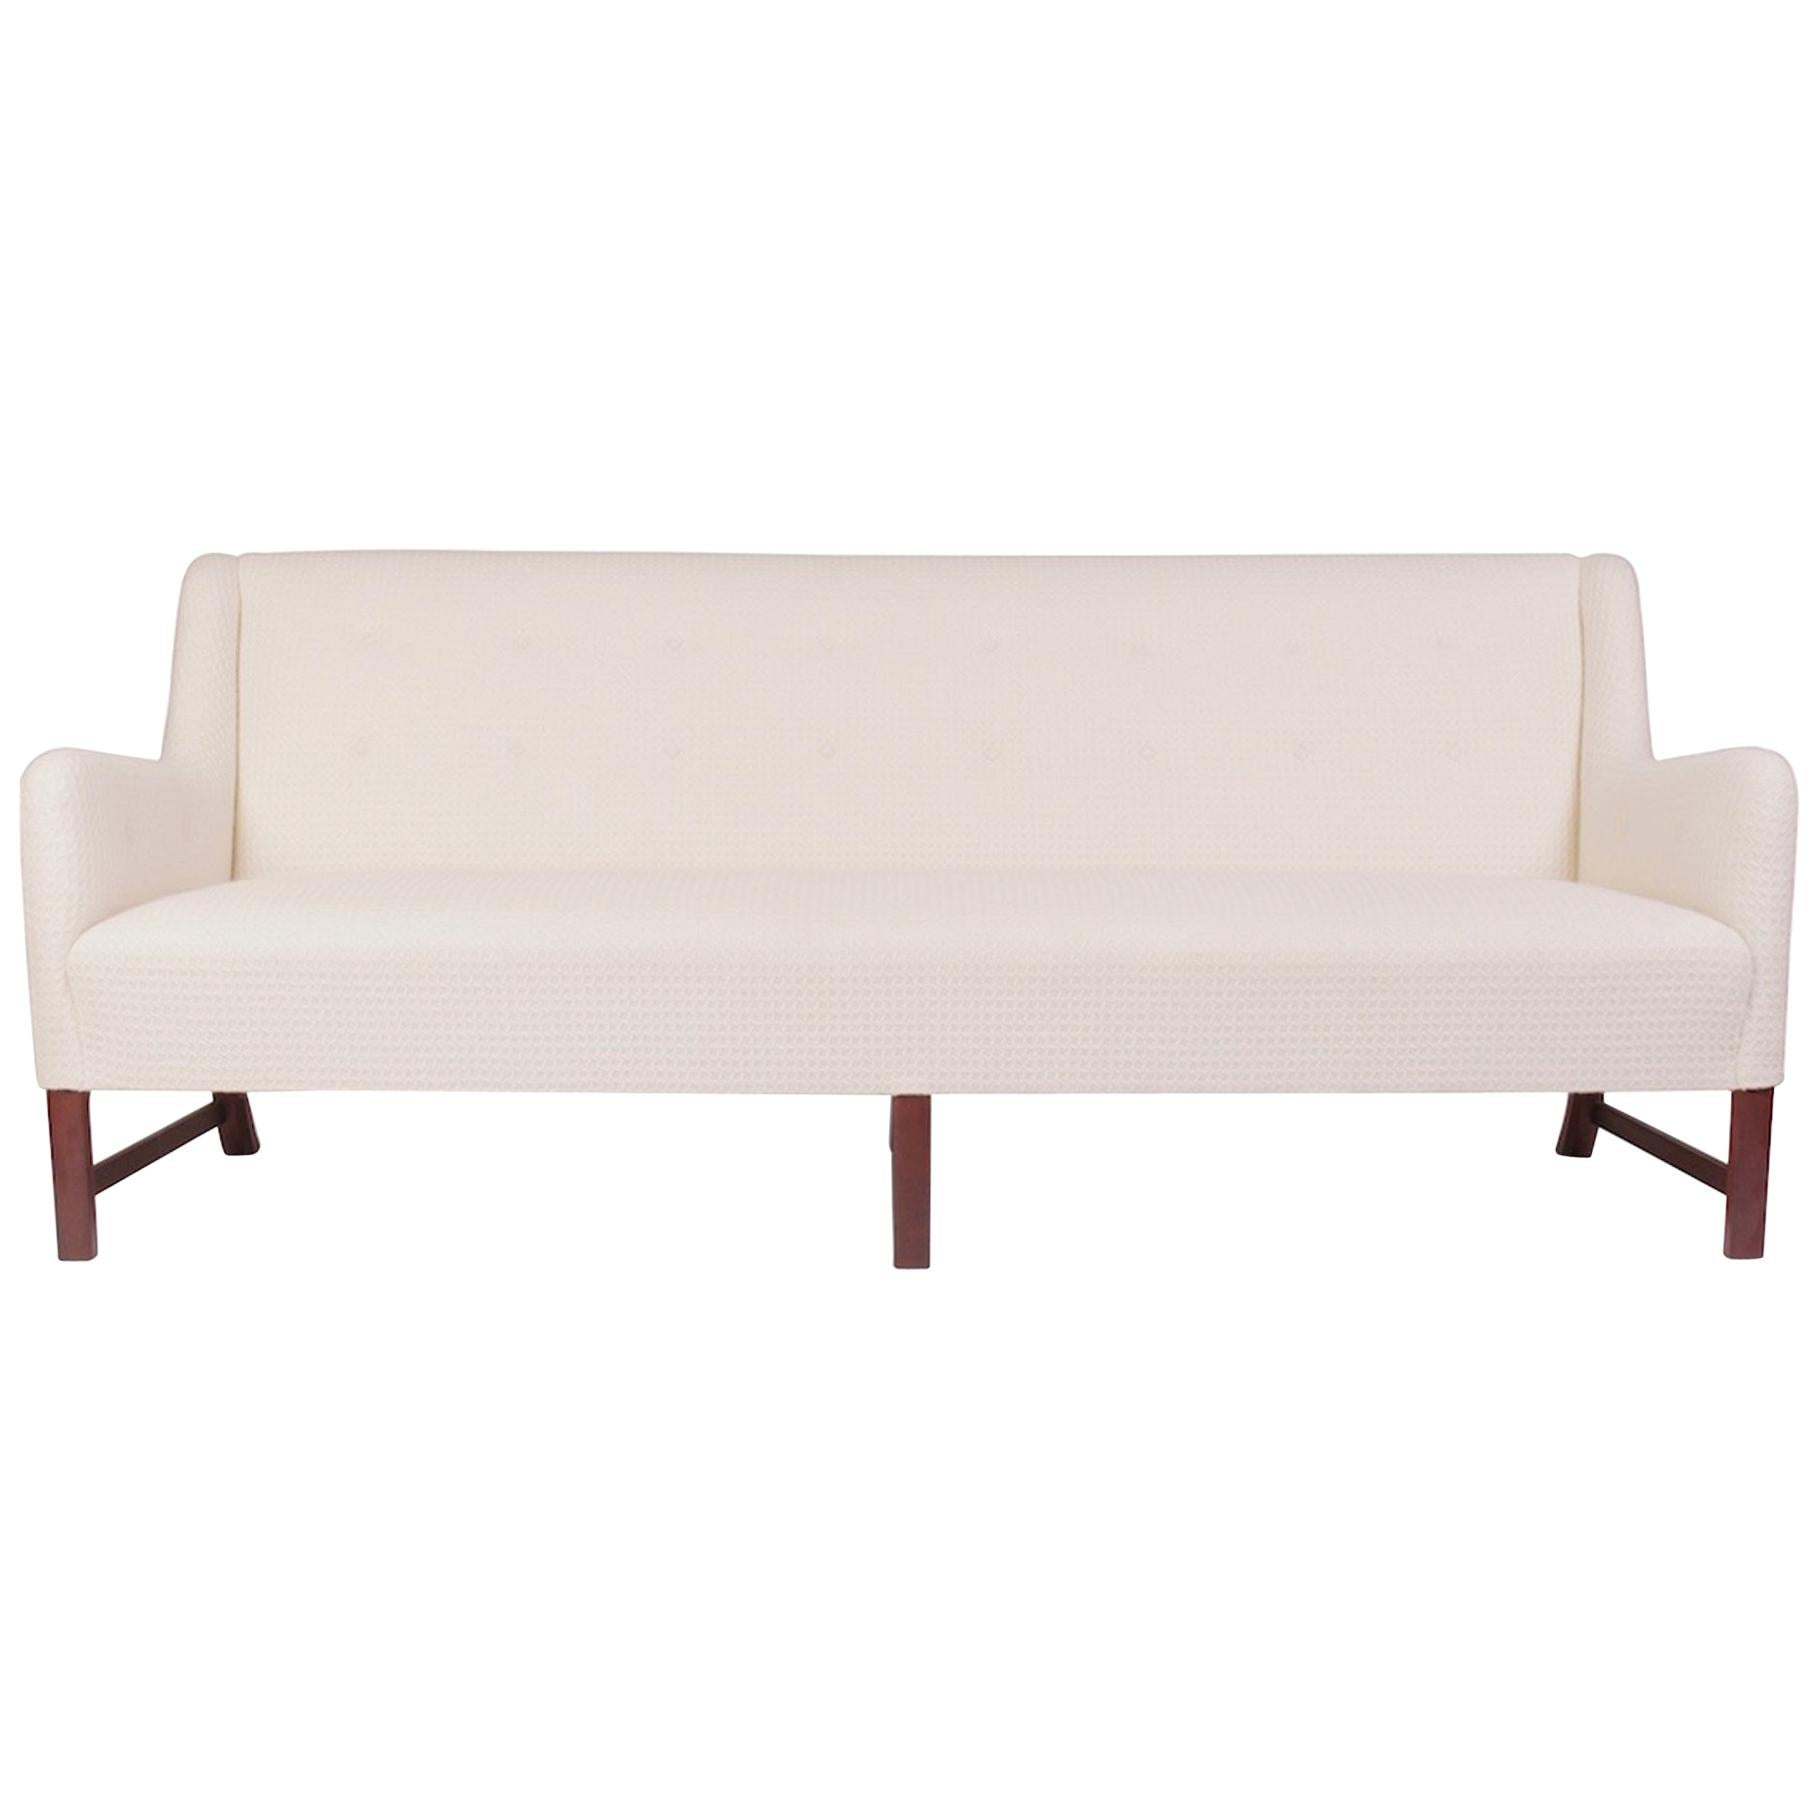 Rare Three-Seat Sofa by Ole Wanscher